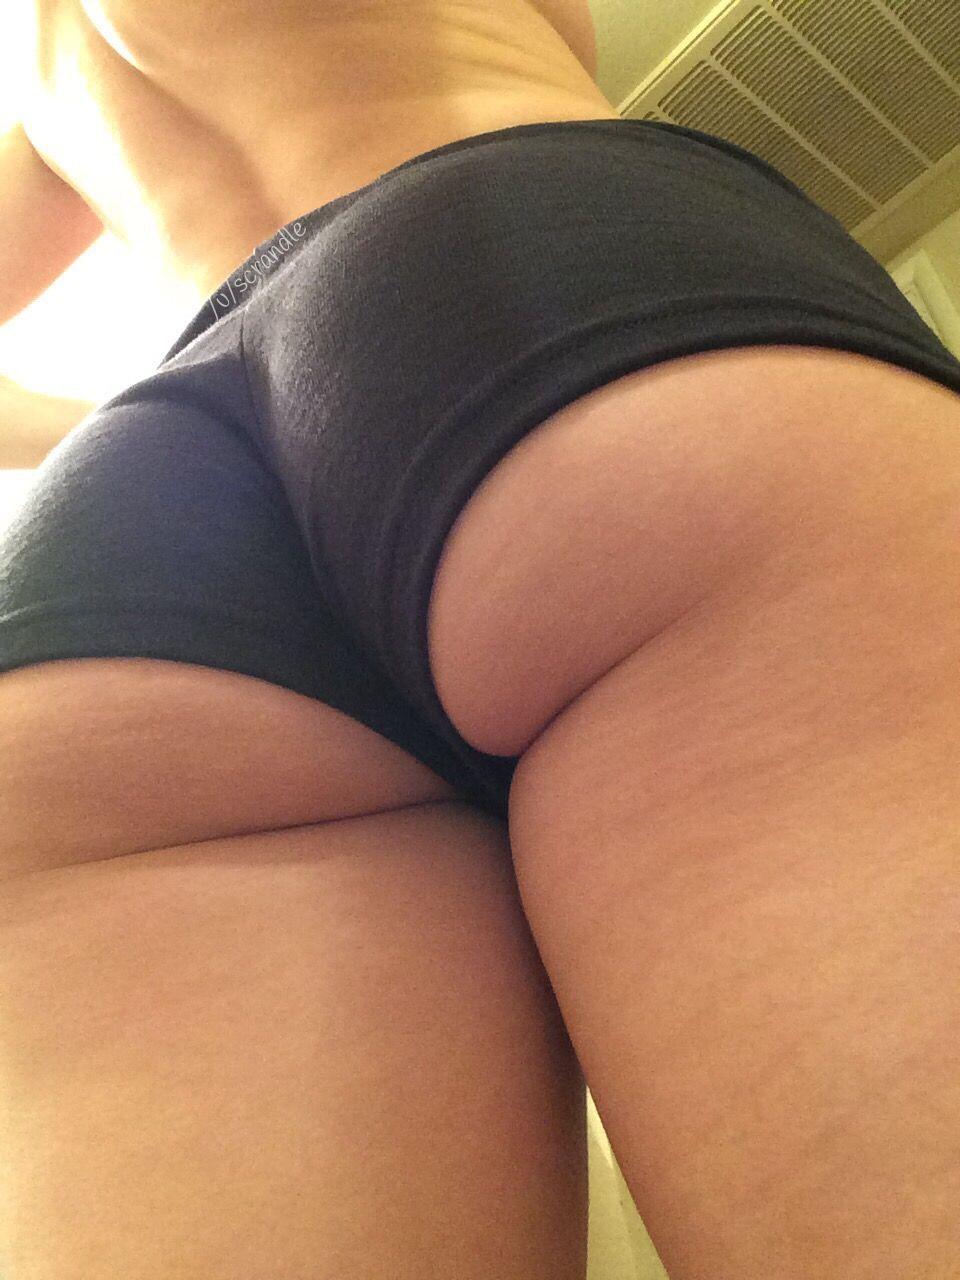 Soffe shorts porn